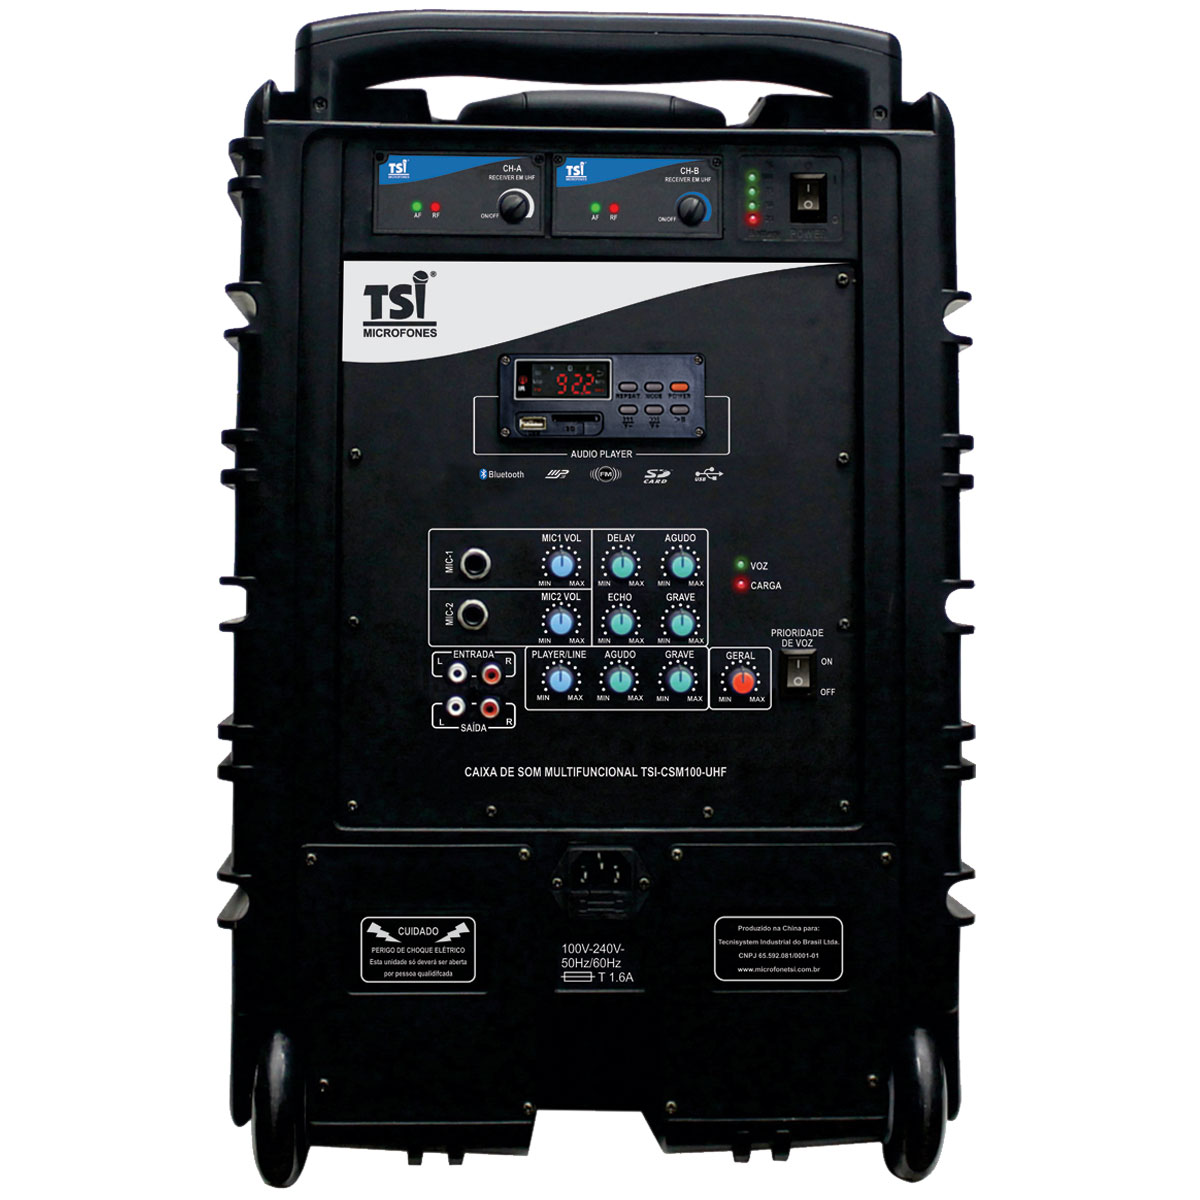 Caixa Ativa Portátil c/ Bateria, Bluetooth, USB e 2 Microfones CSM100-UHF - TSI